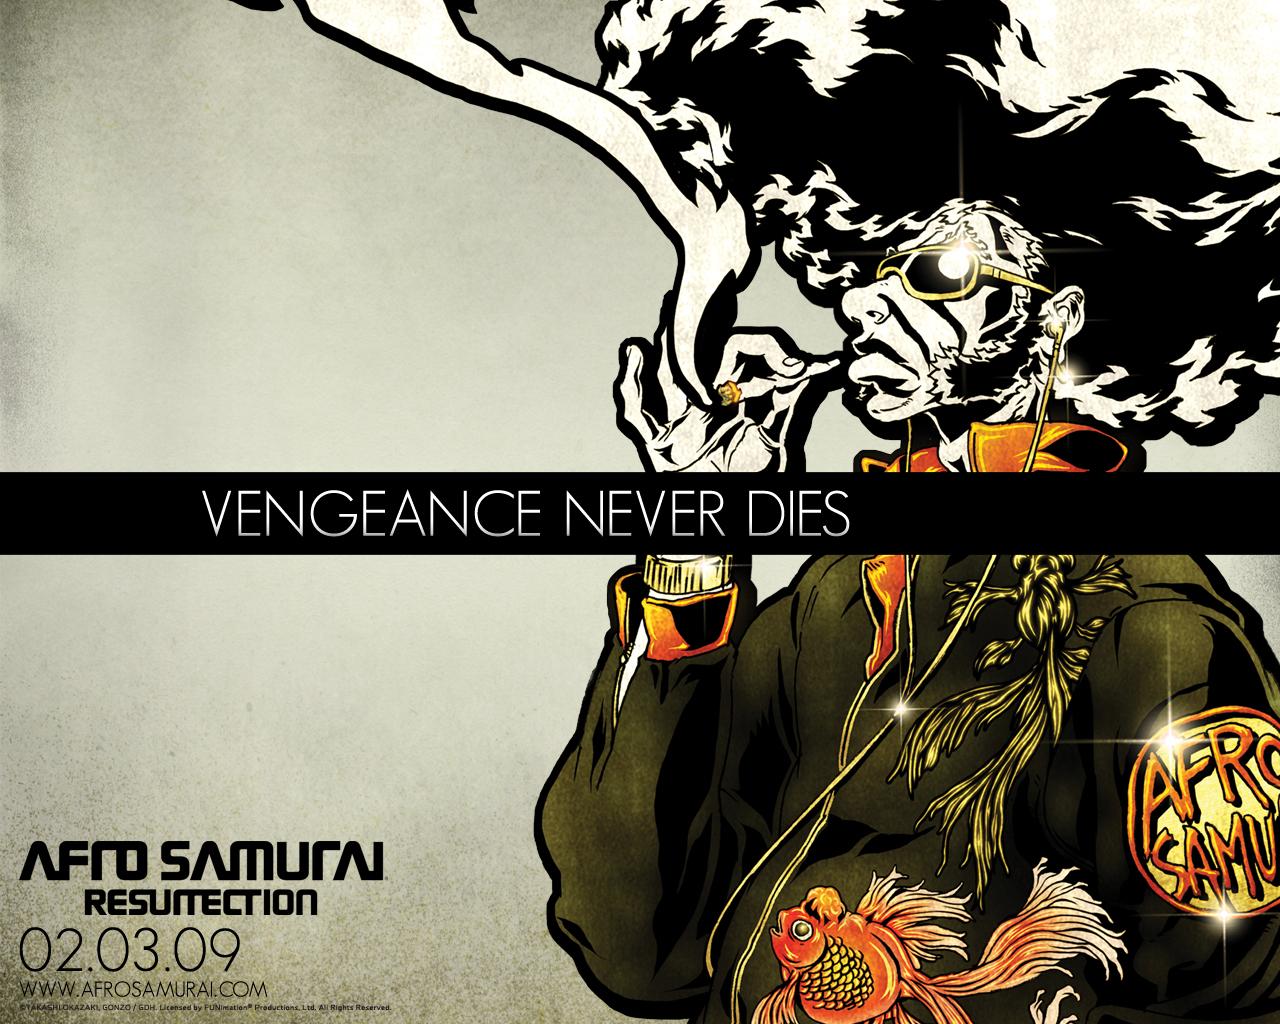 http://4.bp.blogspot.com/_3q85kxCY2Ds/TK0Fei12TrI/AAAAAAAAAlM/6n52TaPUlmA/s1600/Afro_Samurai.jpg